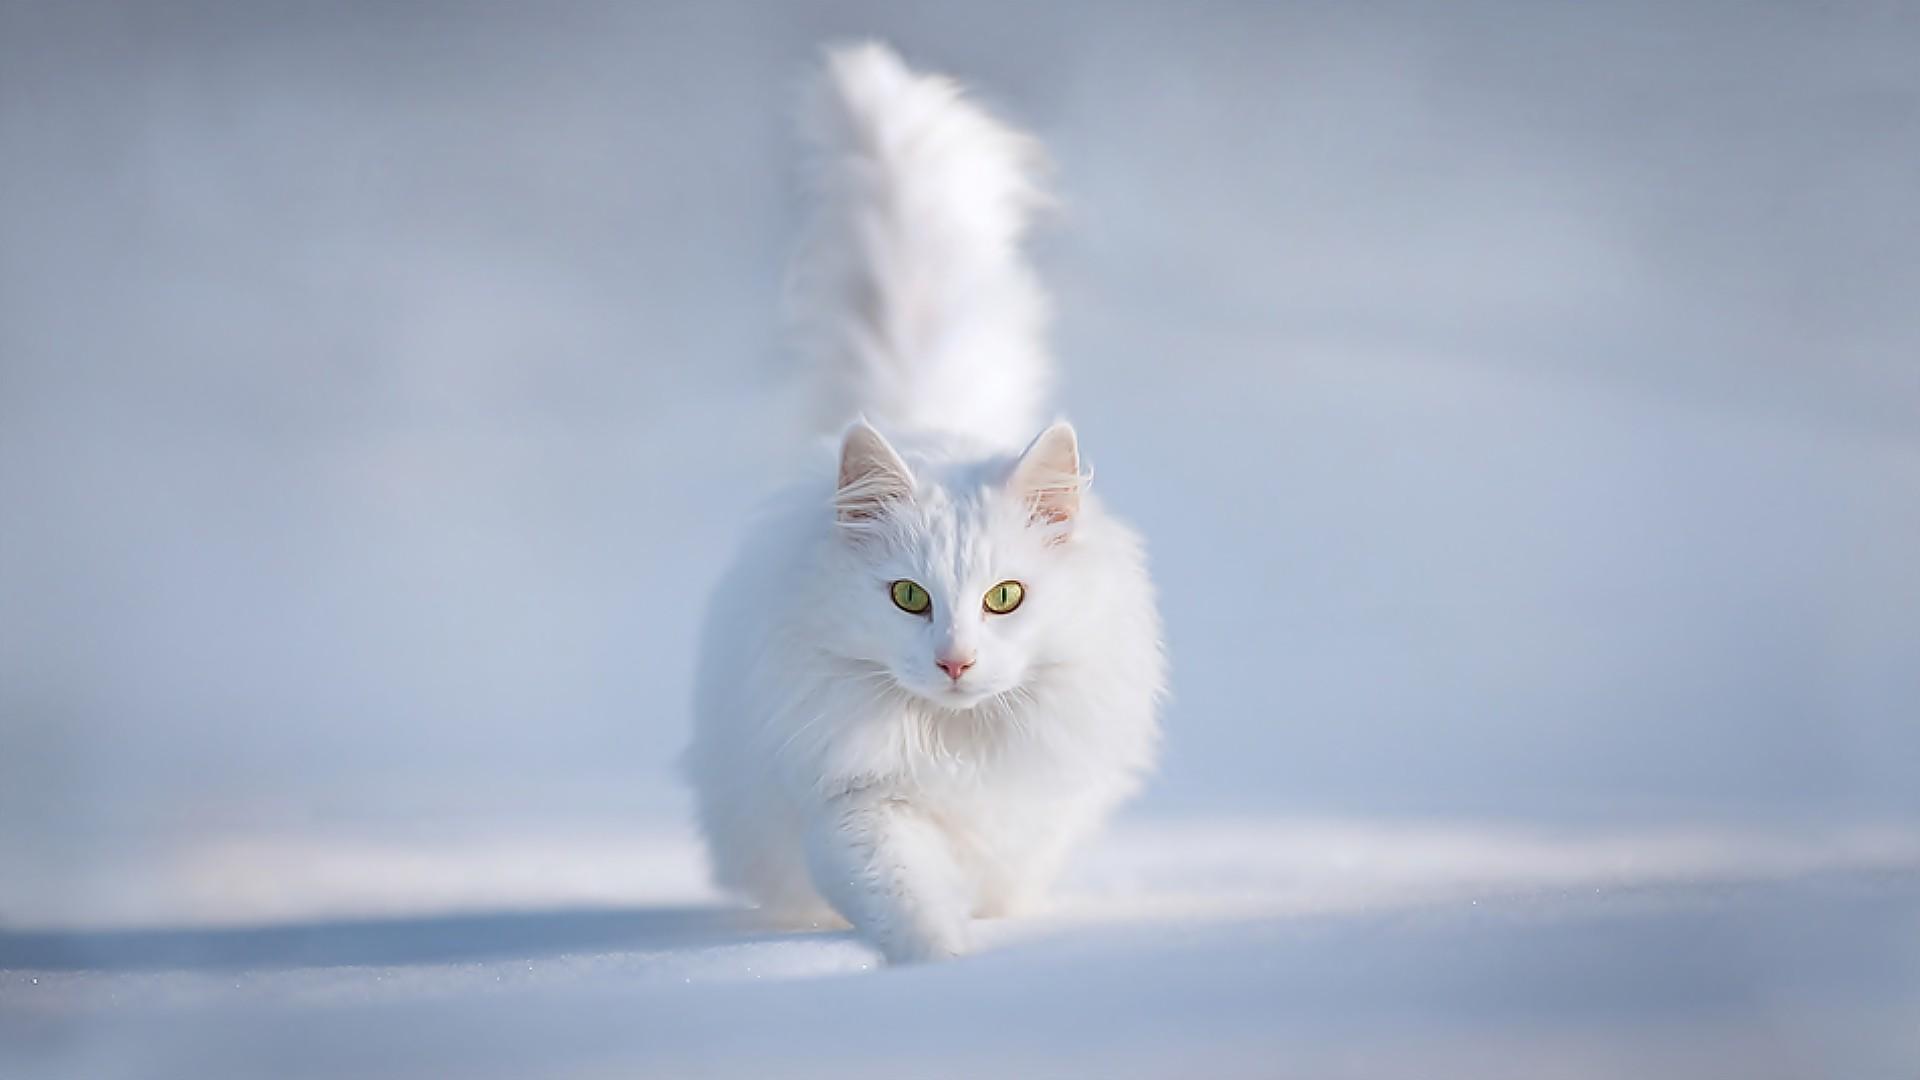 73 White Cat Wallpapers On Wallpapersafari